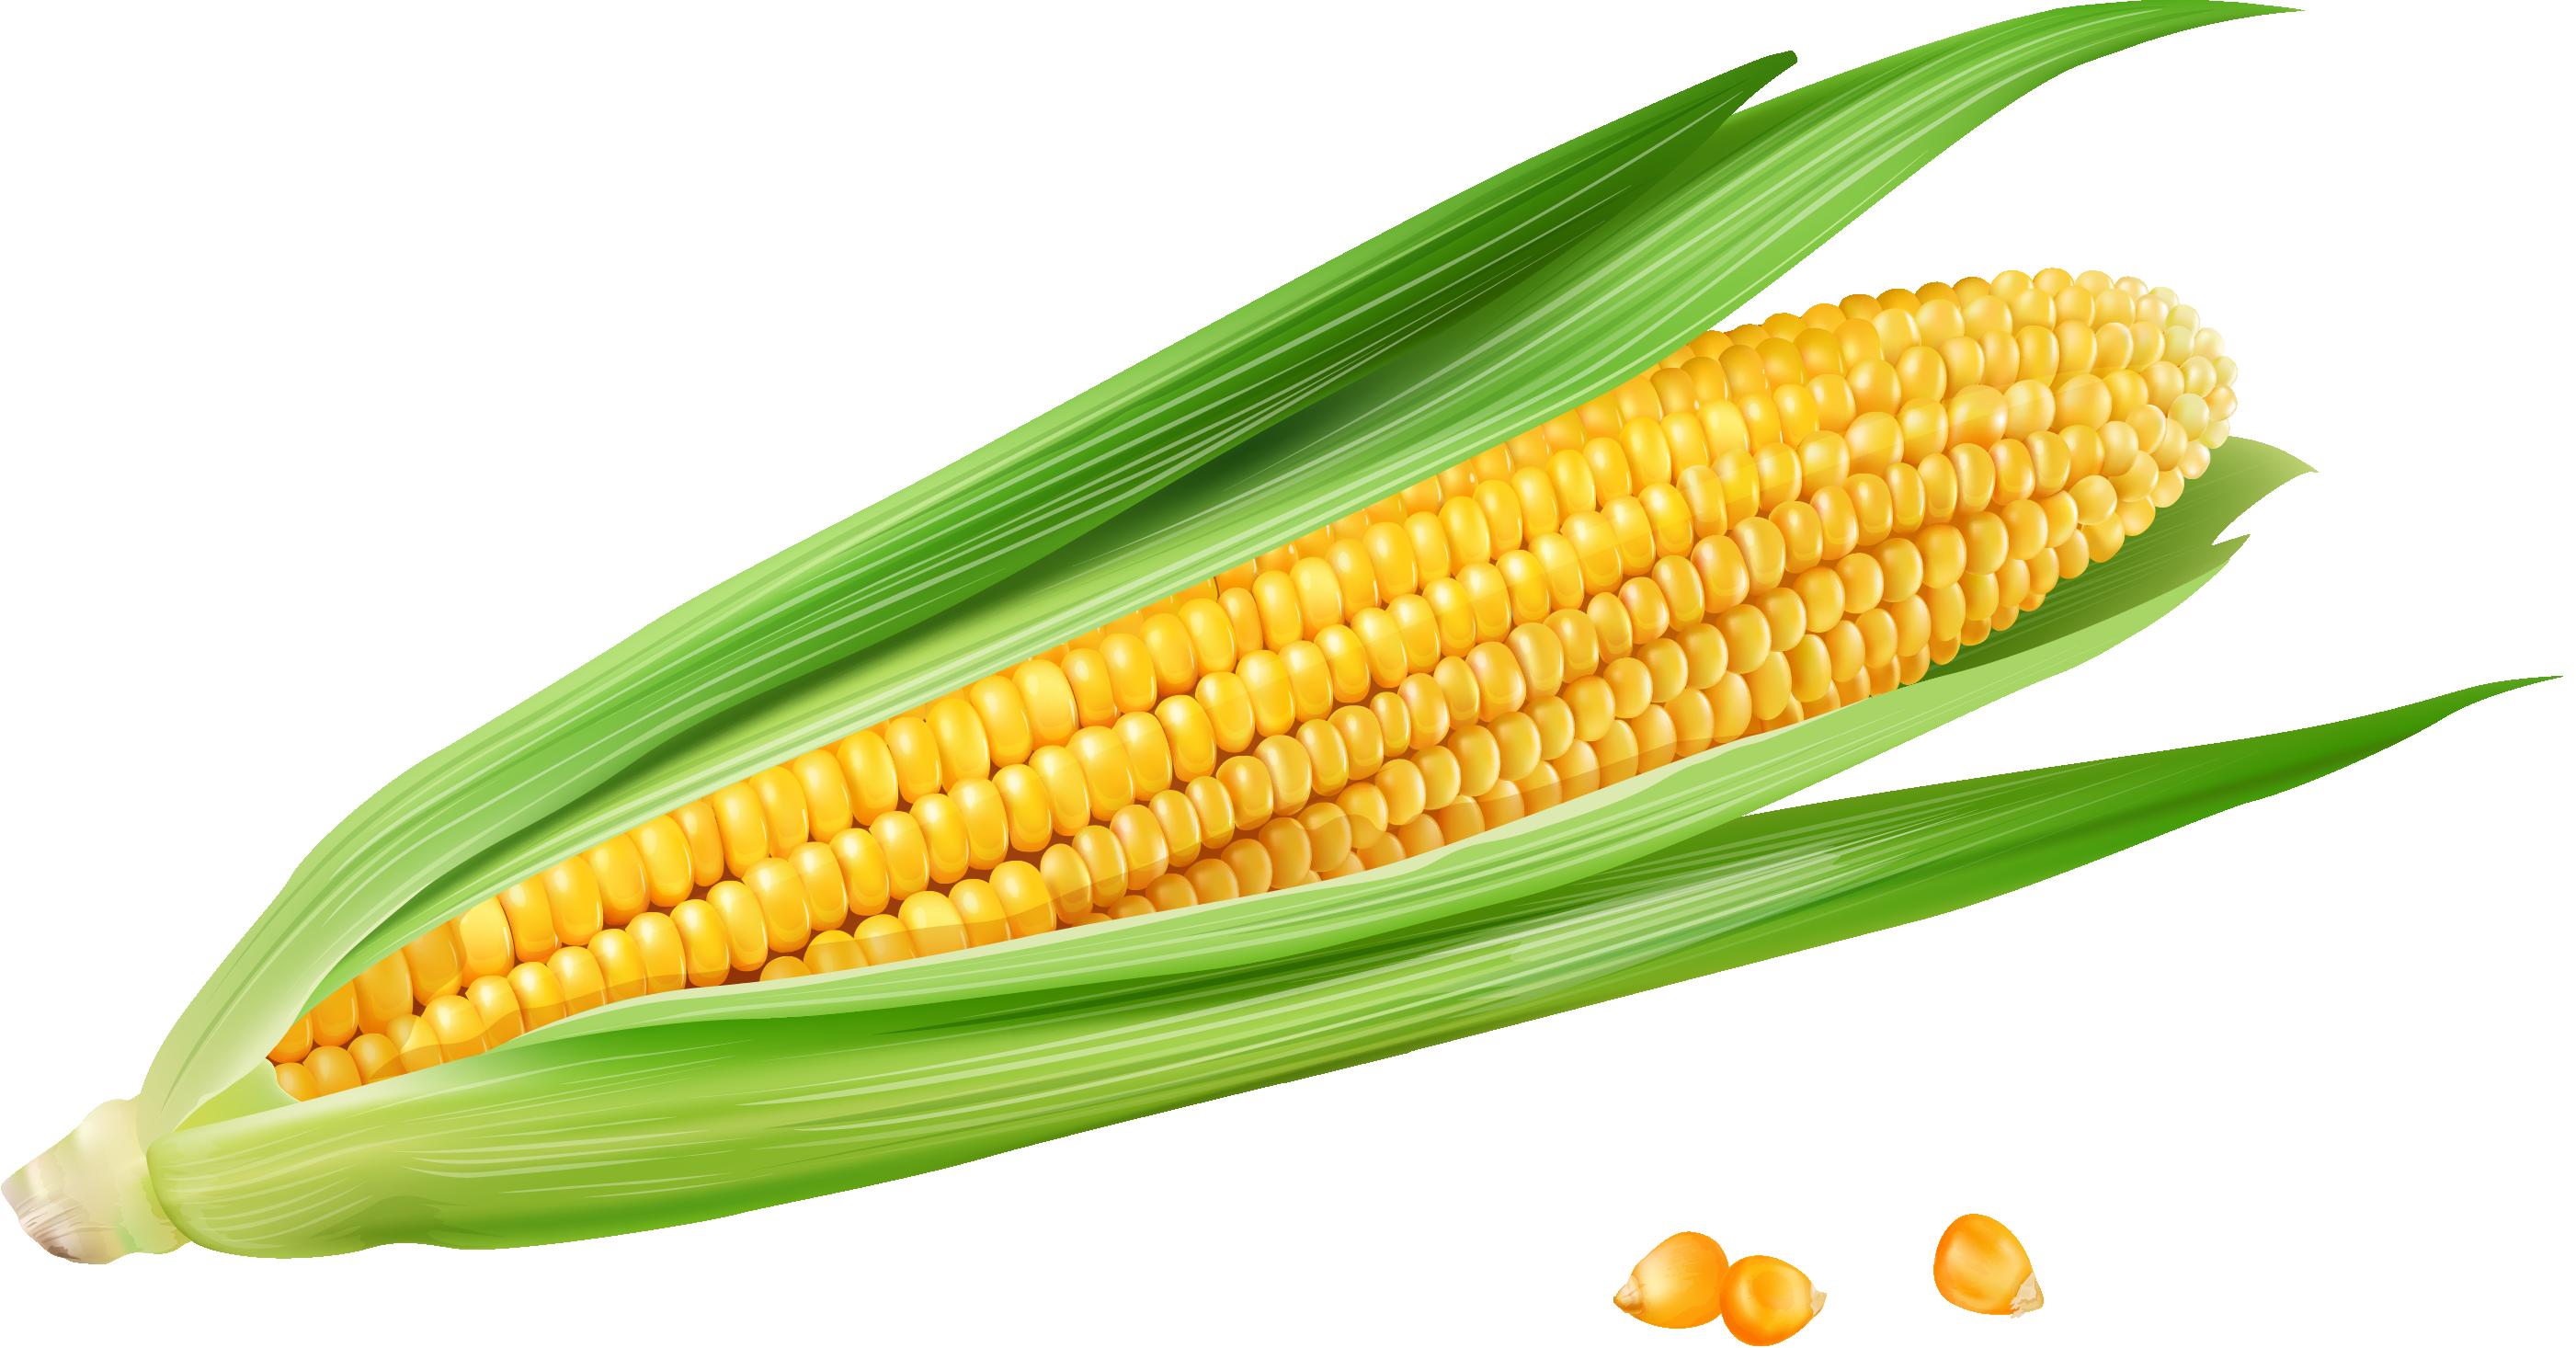 2802x1466 Corn On The Cob Maize Euclidean Vector Vecteur